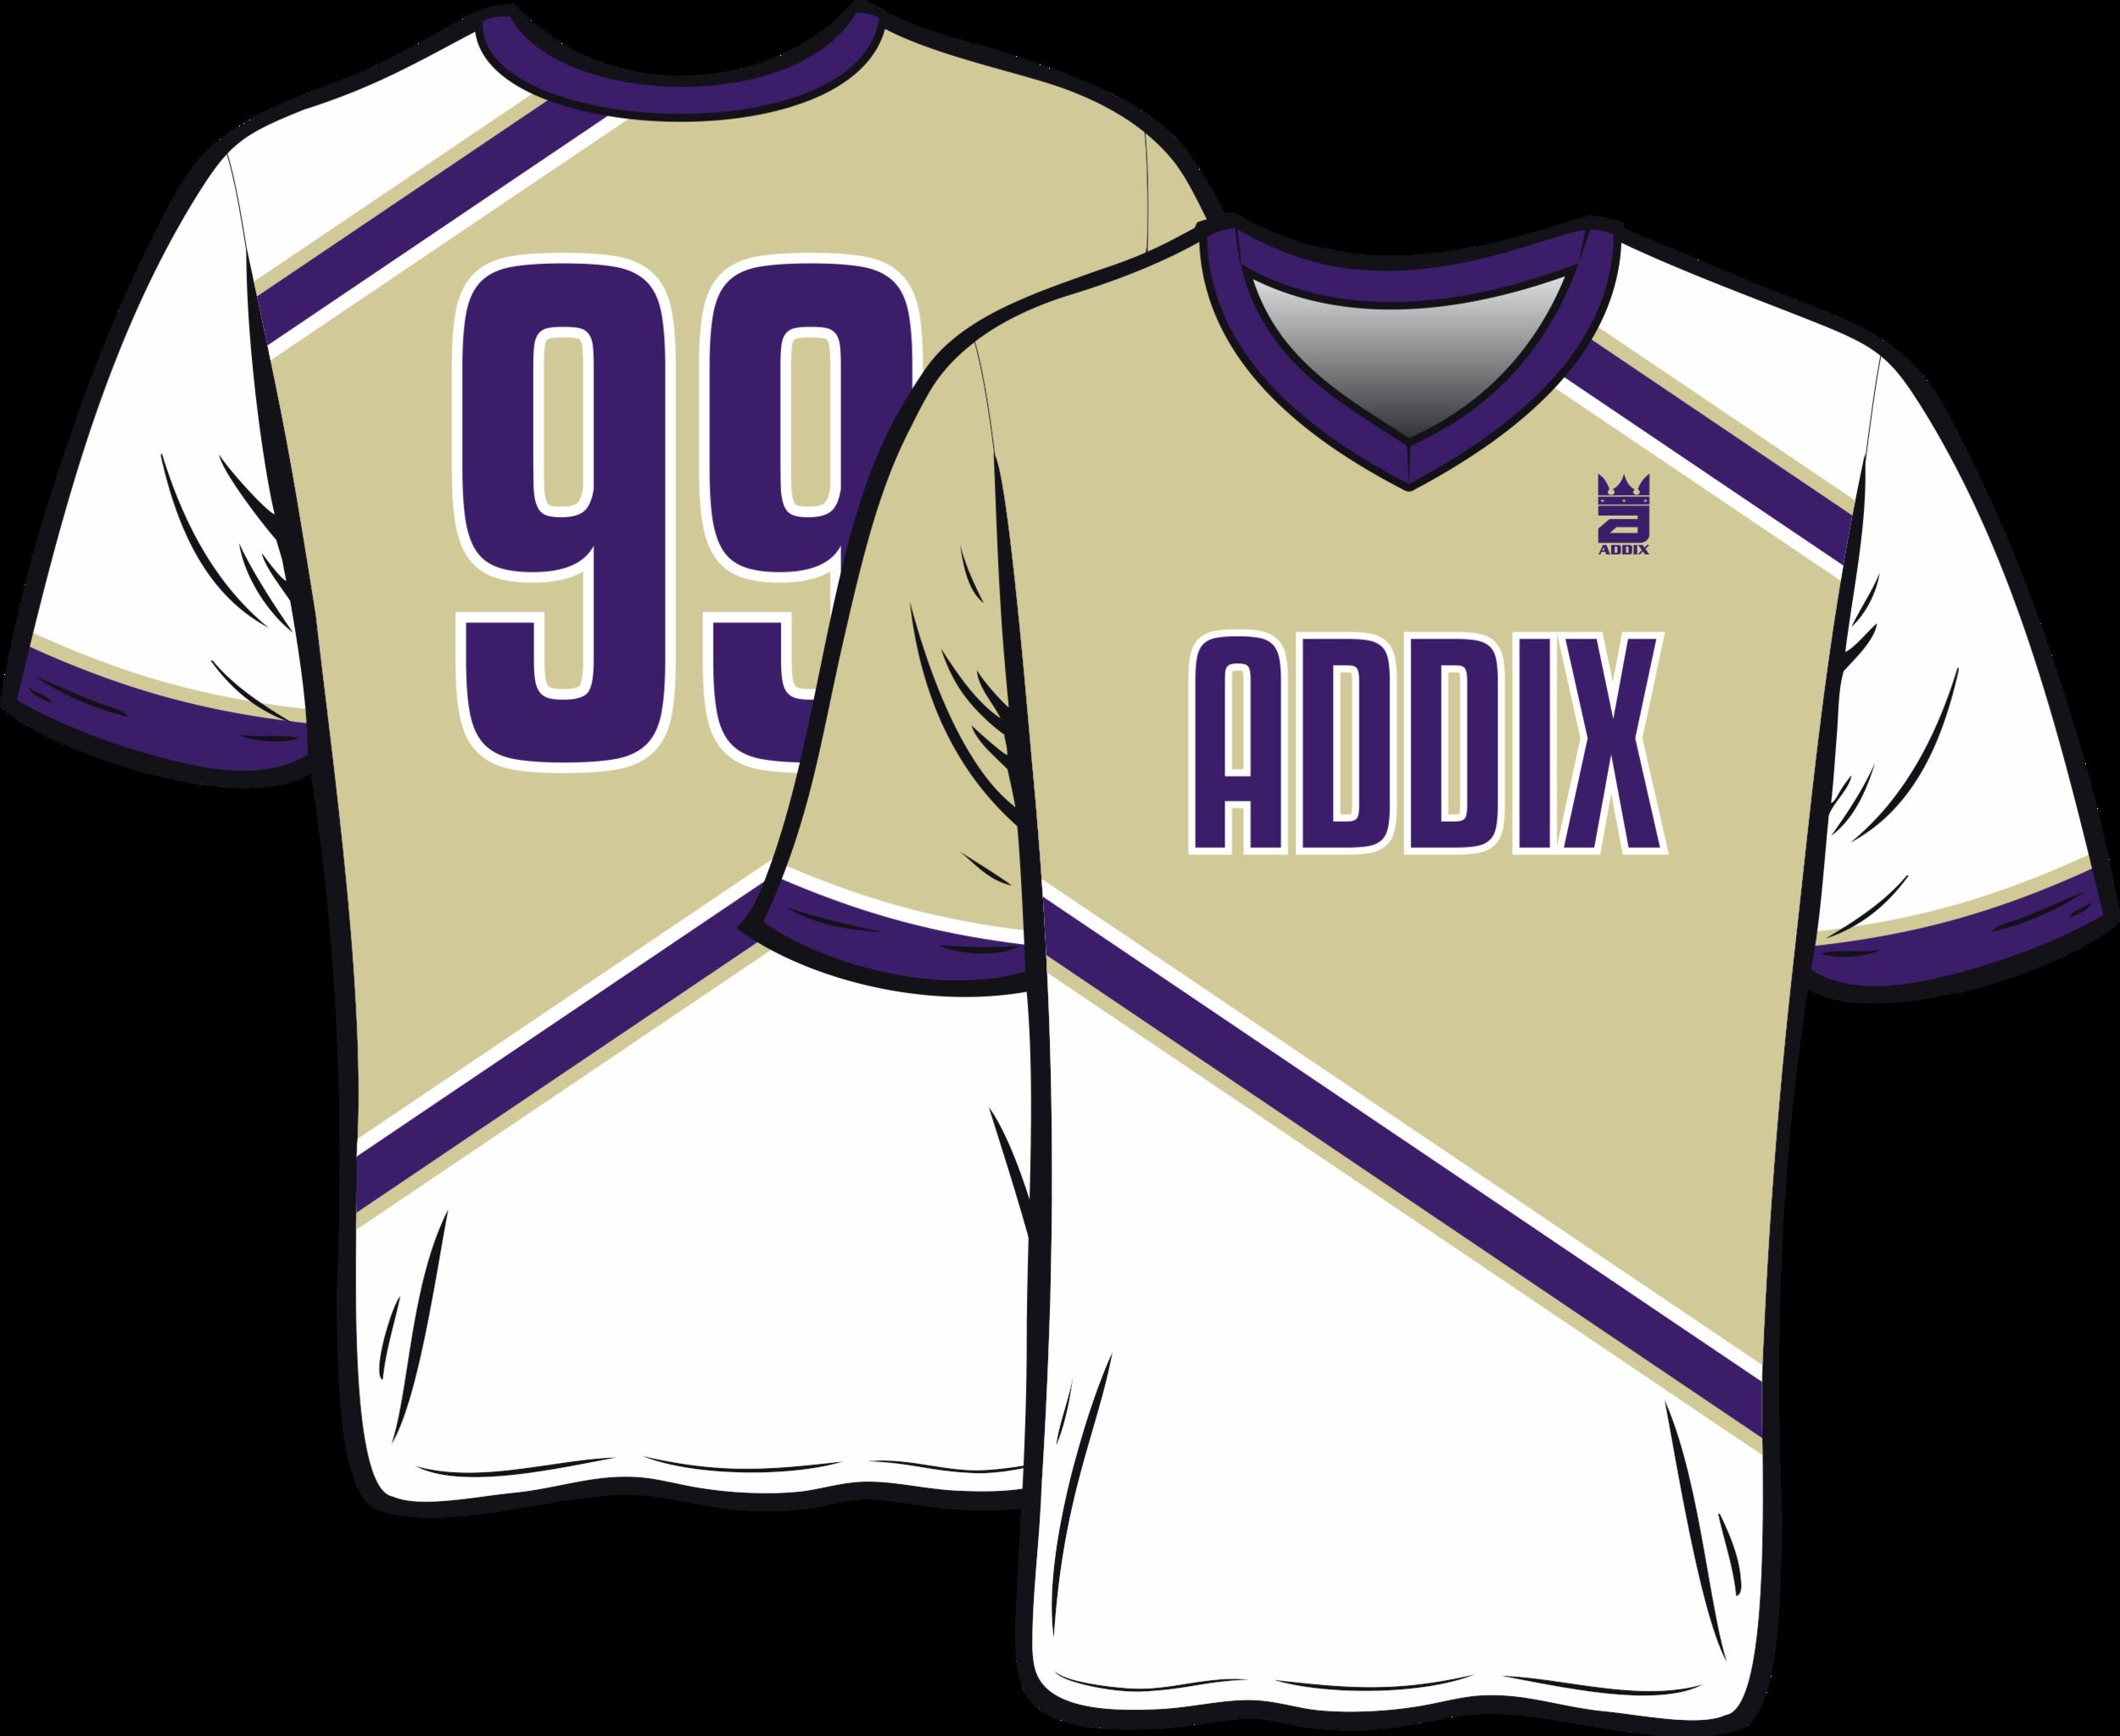 ADDIX HEADER